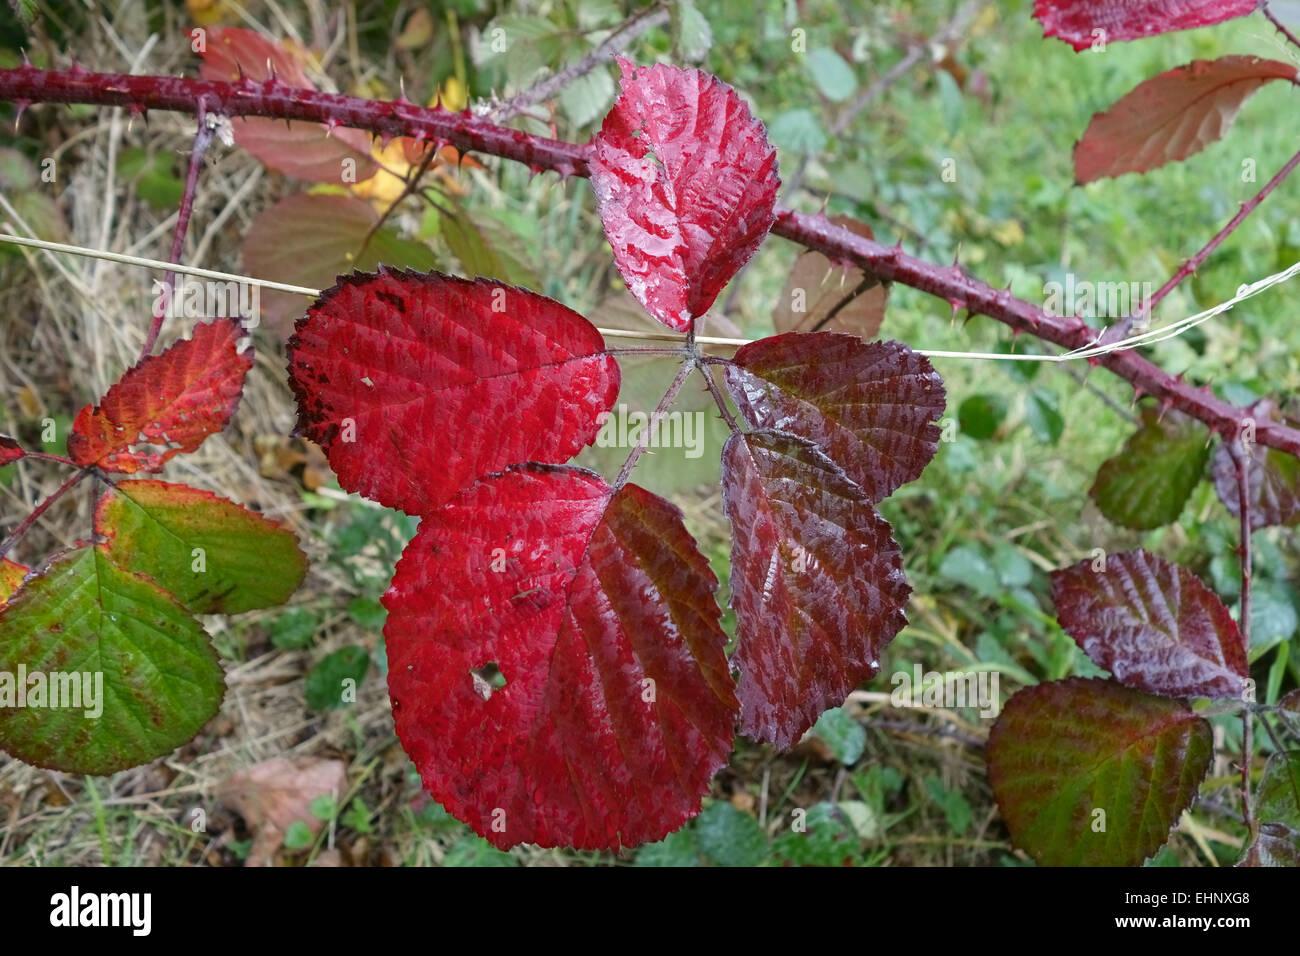 Red bramble, Rubus fruticosus, leaves turning colour in autumn, October - Stock Image